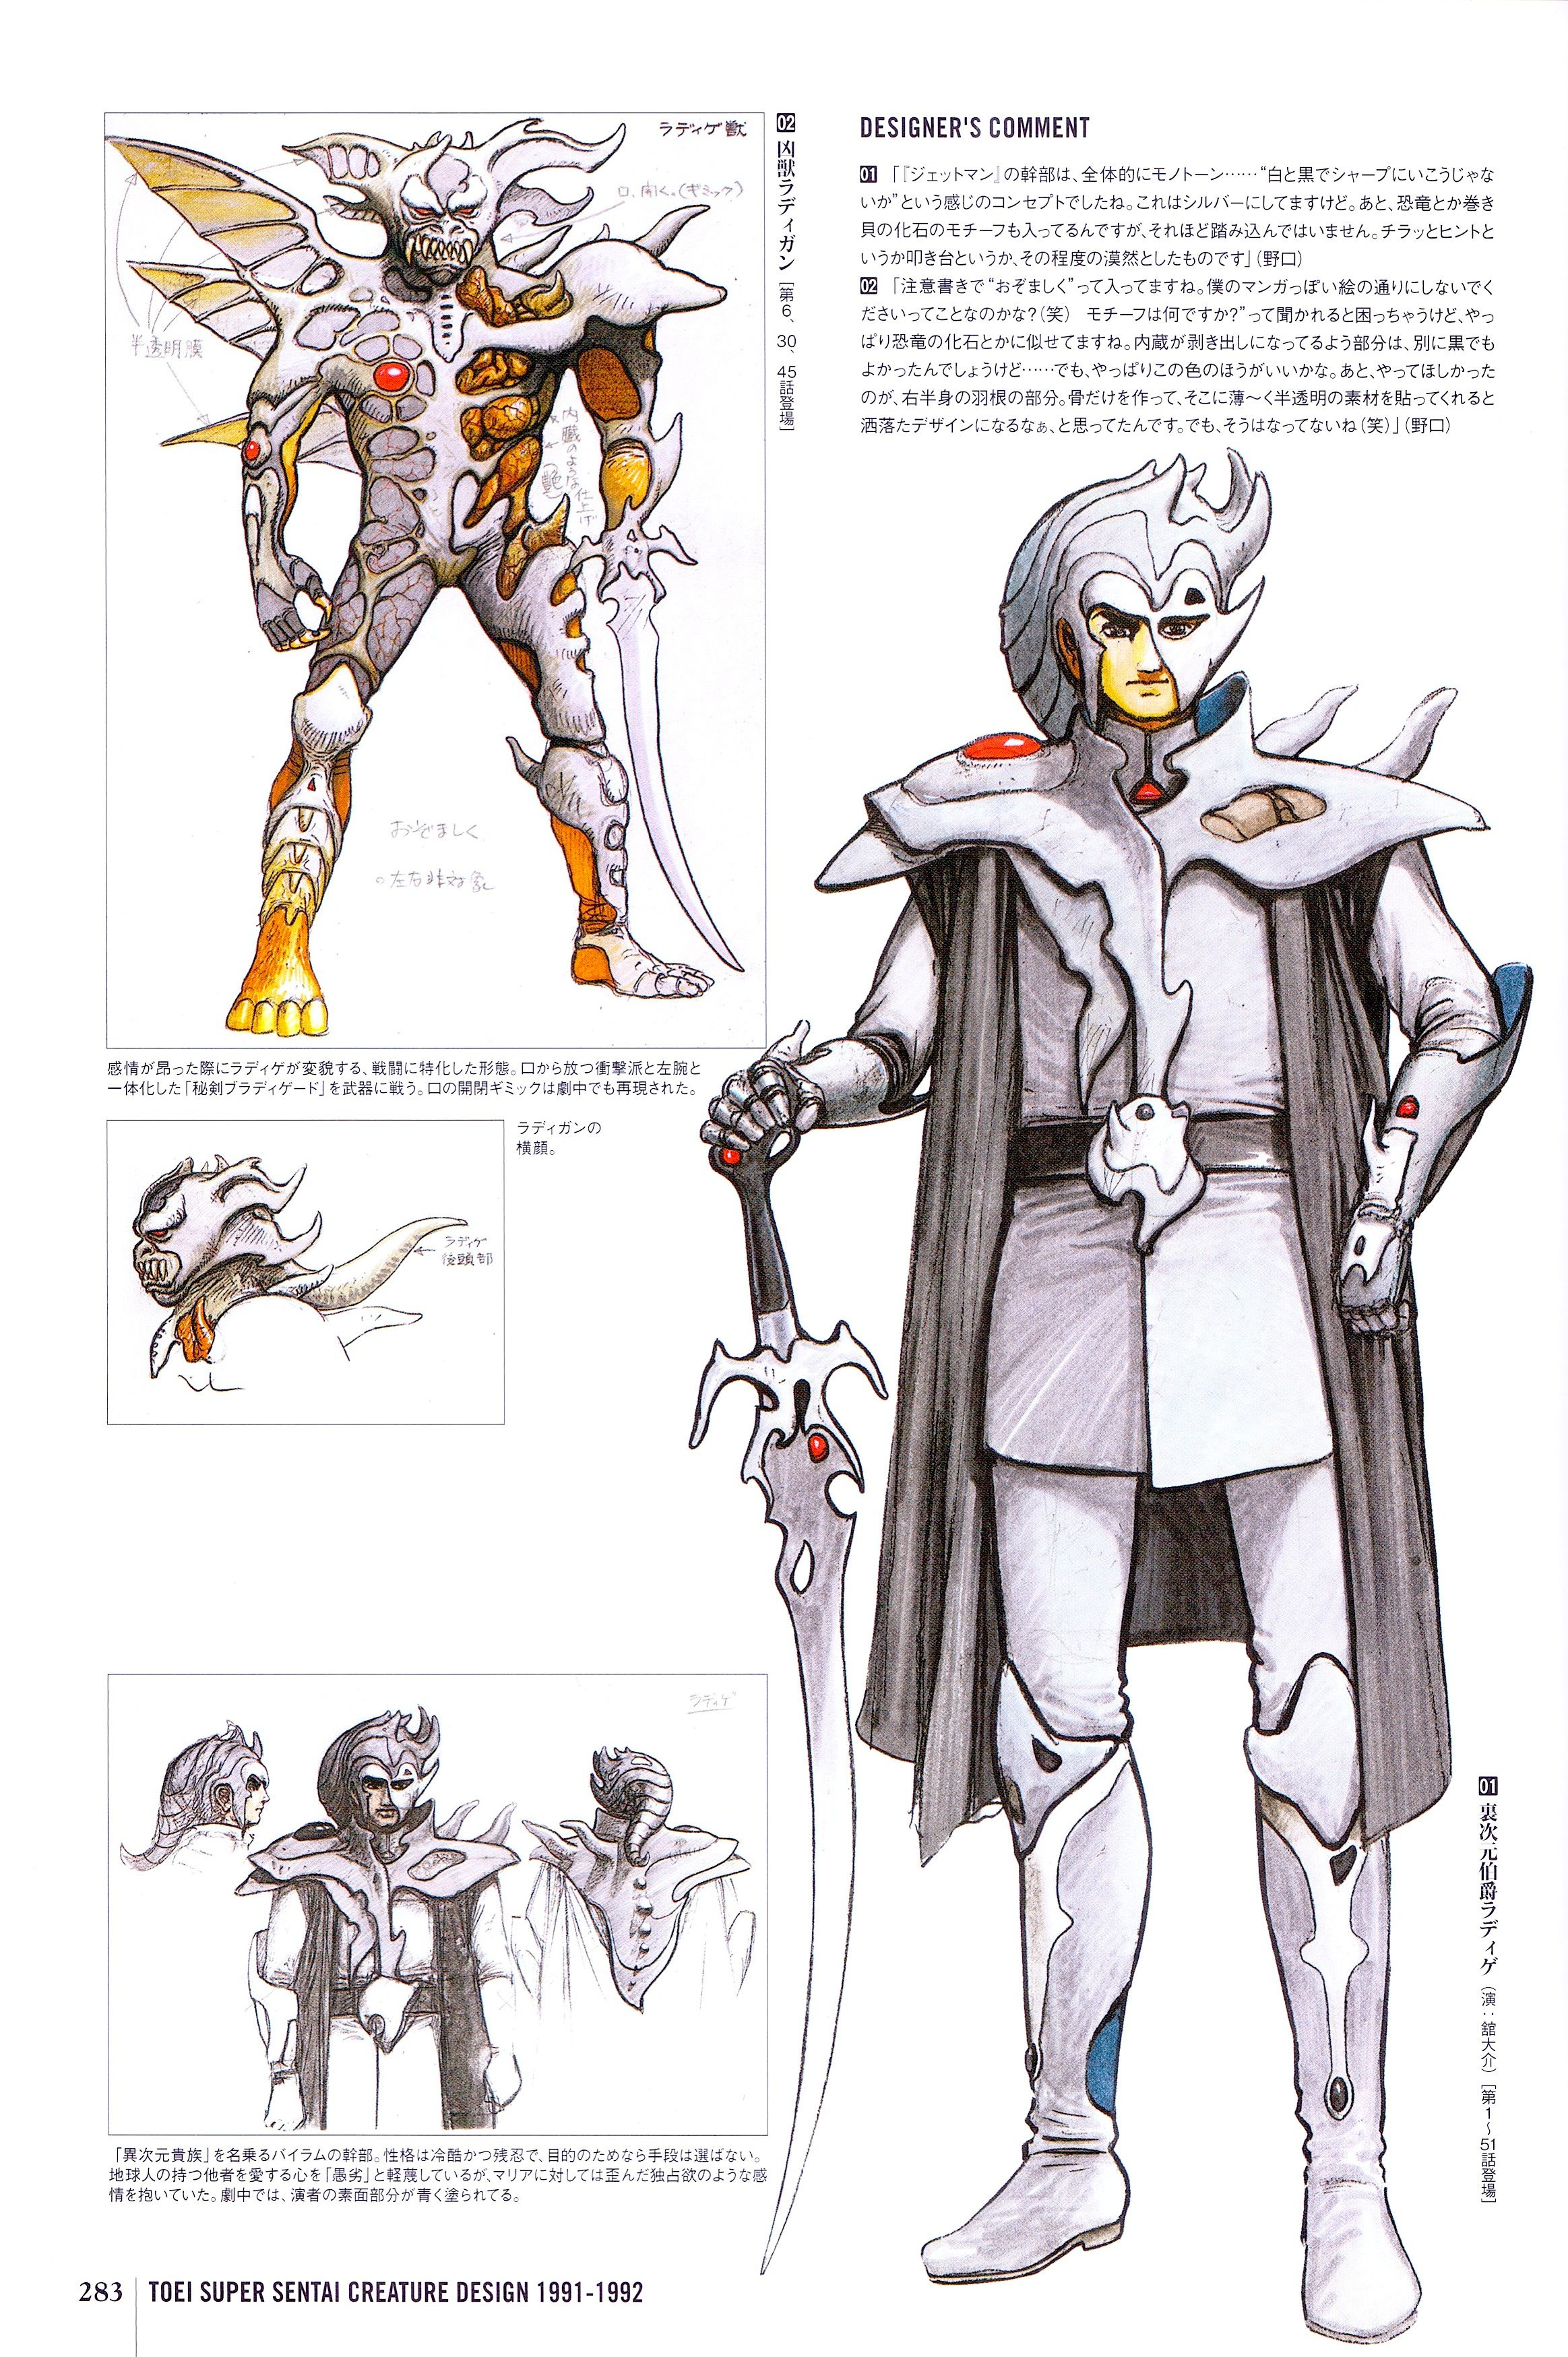 Kaiju History 1991 Jetman キャラクターデザイン, プロダクトスケッチ, ロゴデザイン